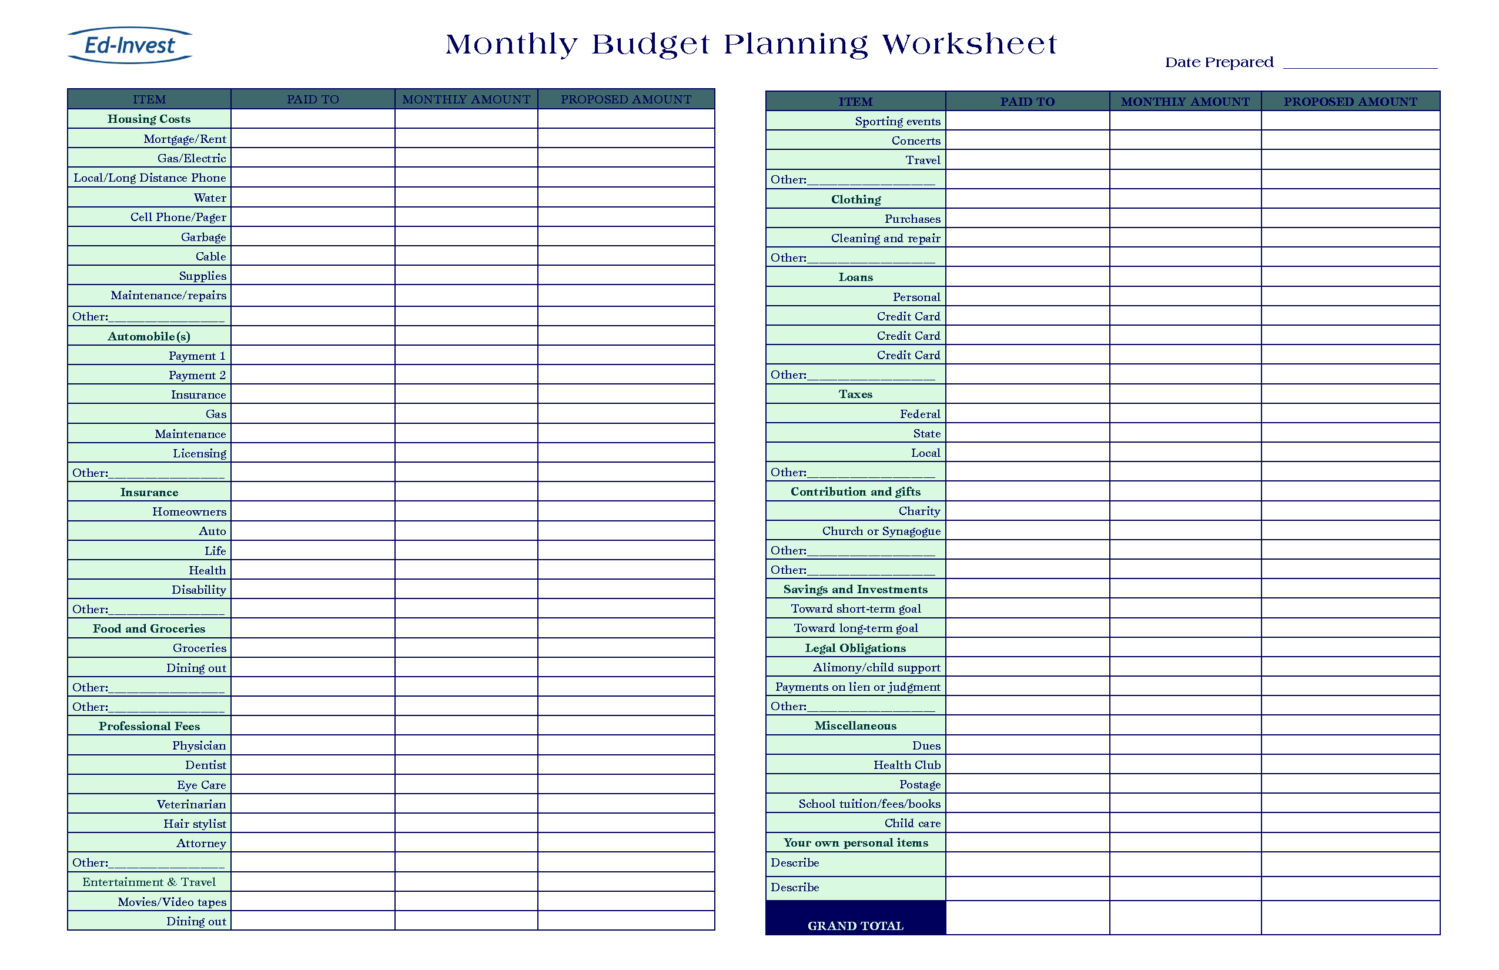 Money Management Excel Spreadsheet Pertaining To Money Management Template Excel  Iwantingsarticle, Media, Sports